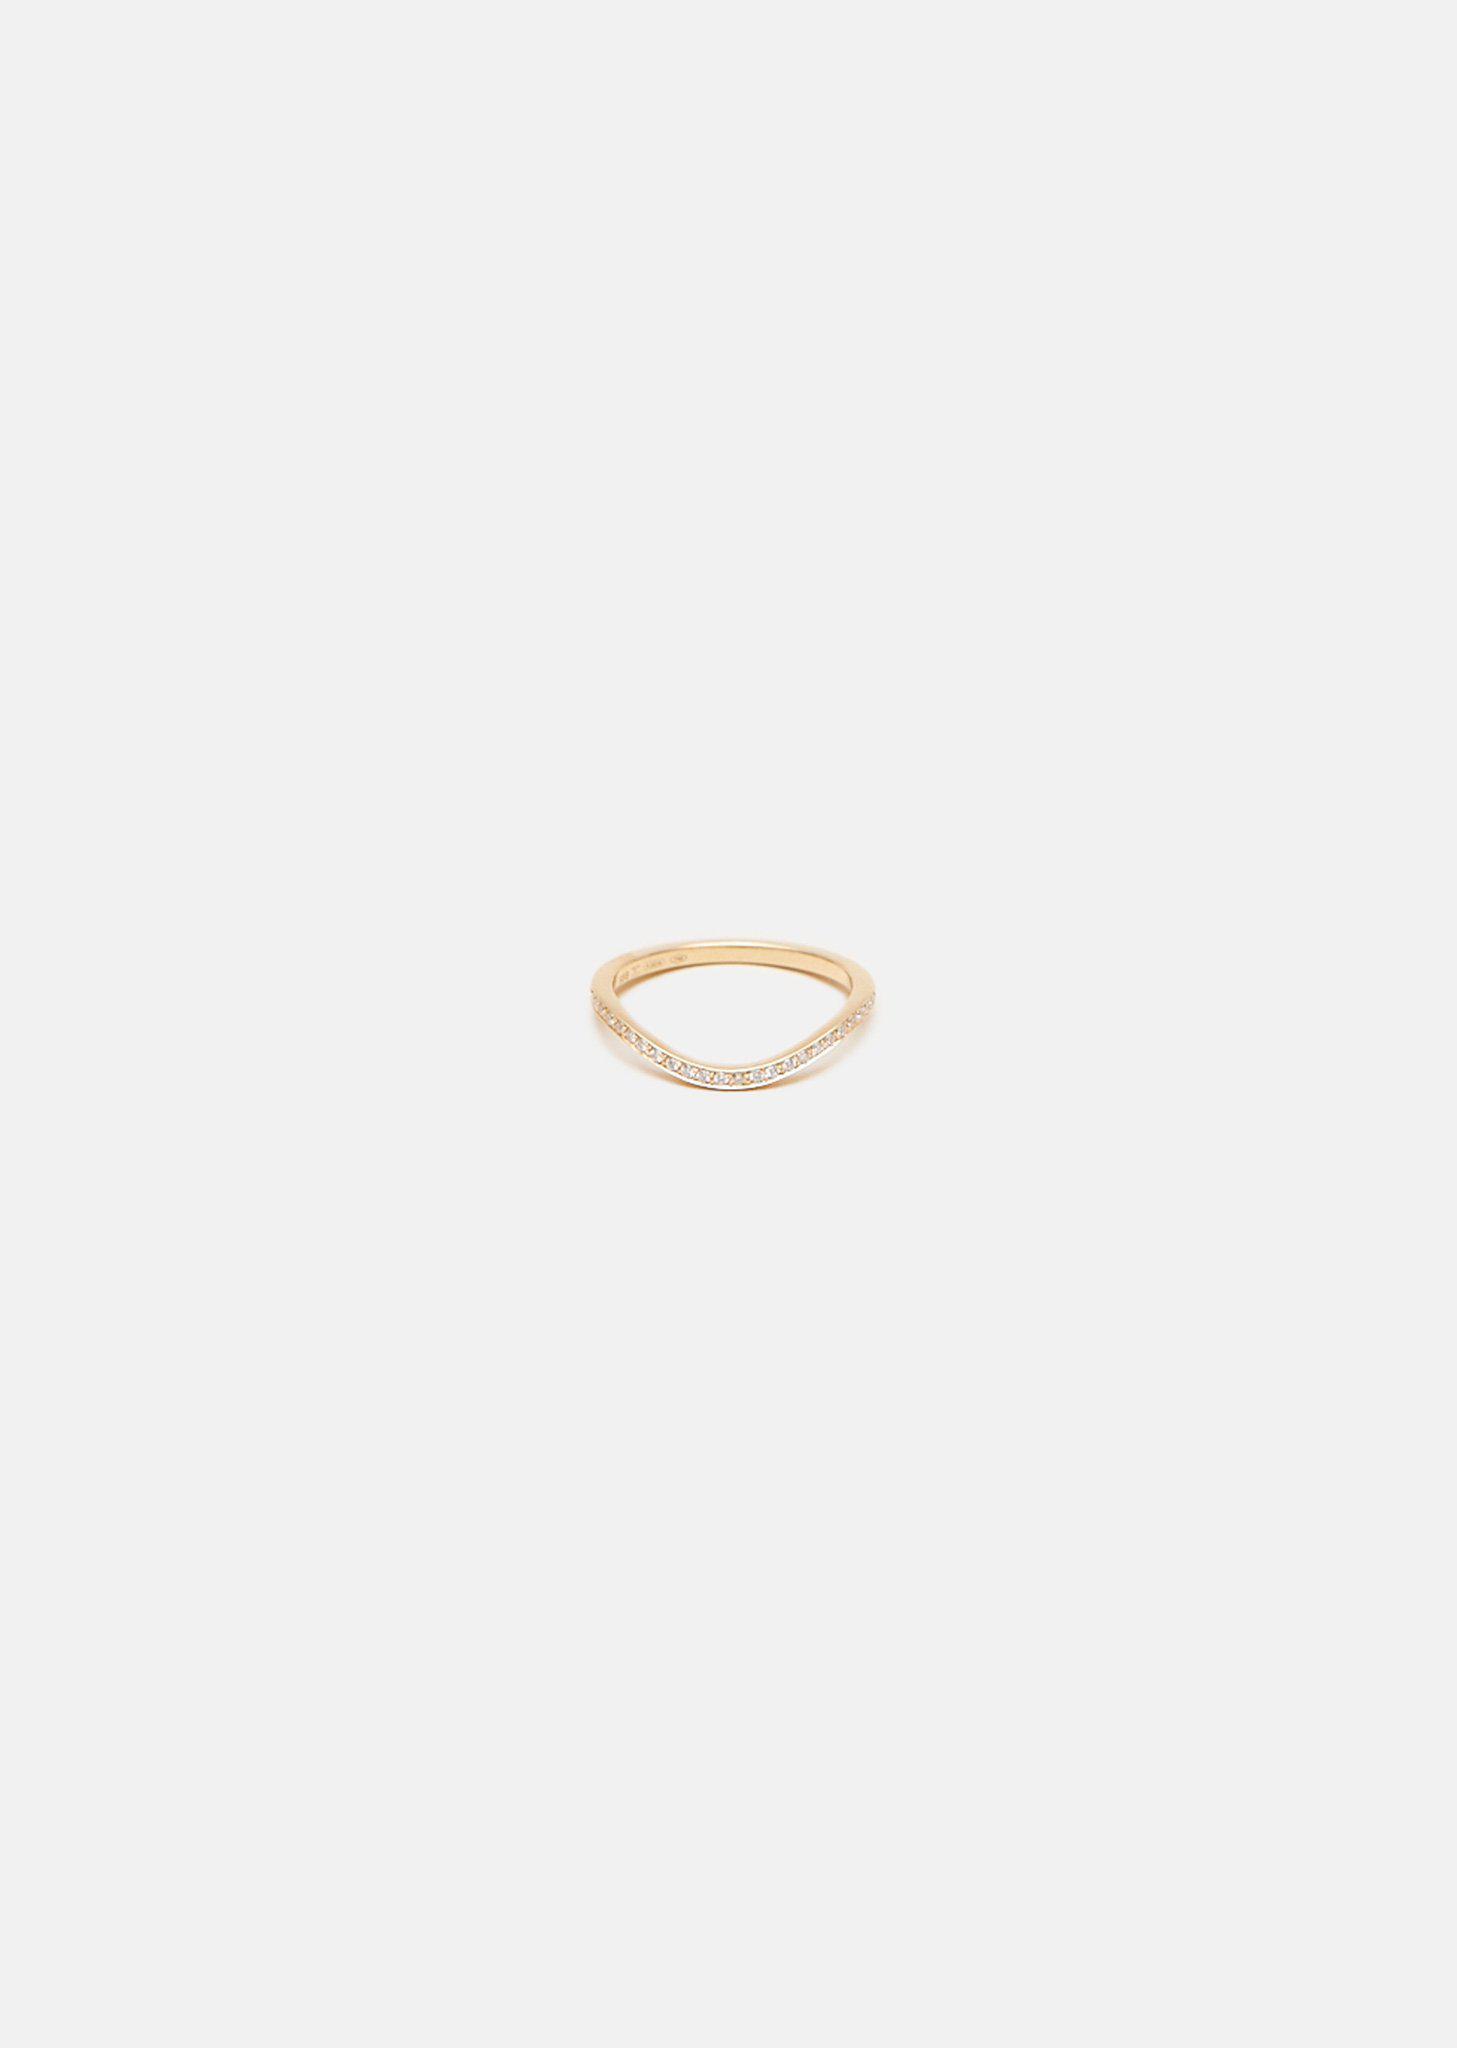 Sophie Bille Brahe Grace Ring in 18 kt Yellow Gold, 0.09 ct. tw.v (Metallic)